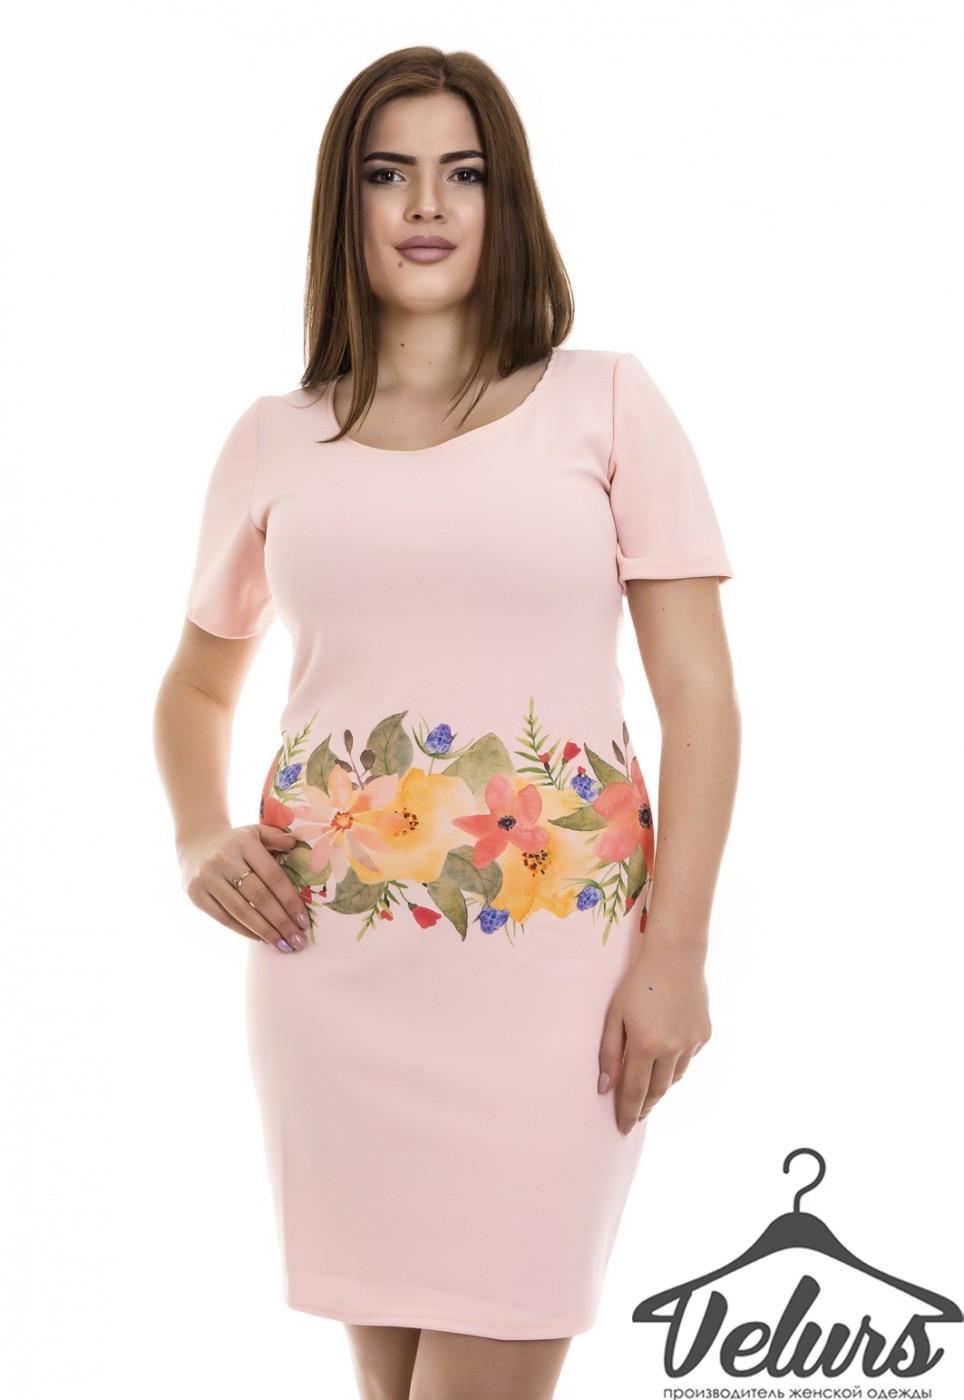 Velurs: Платье 212126 - фото 8